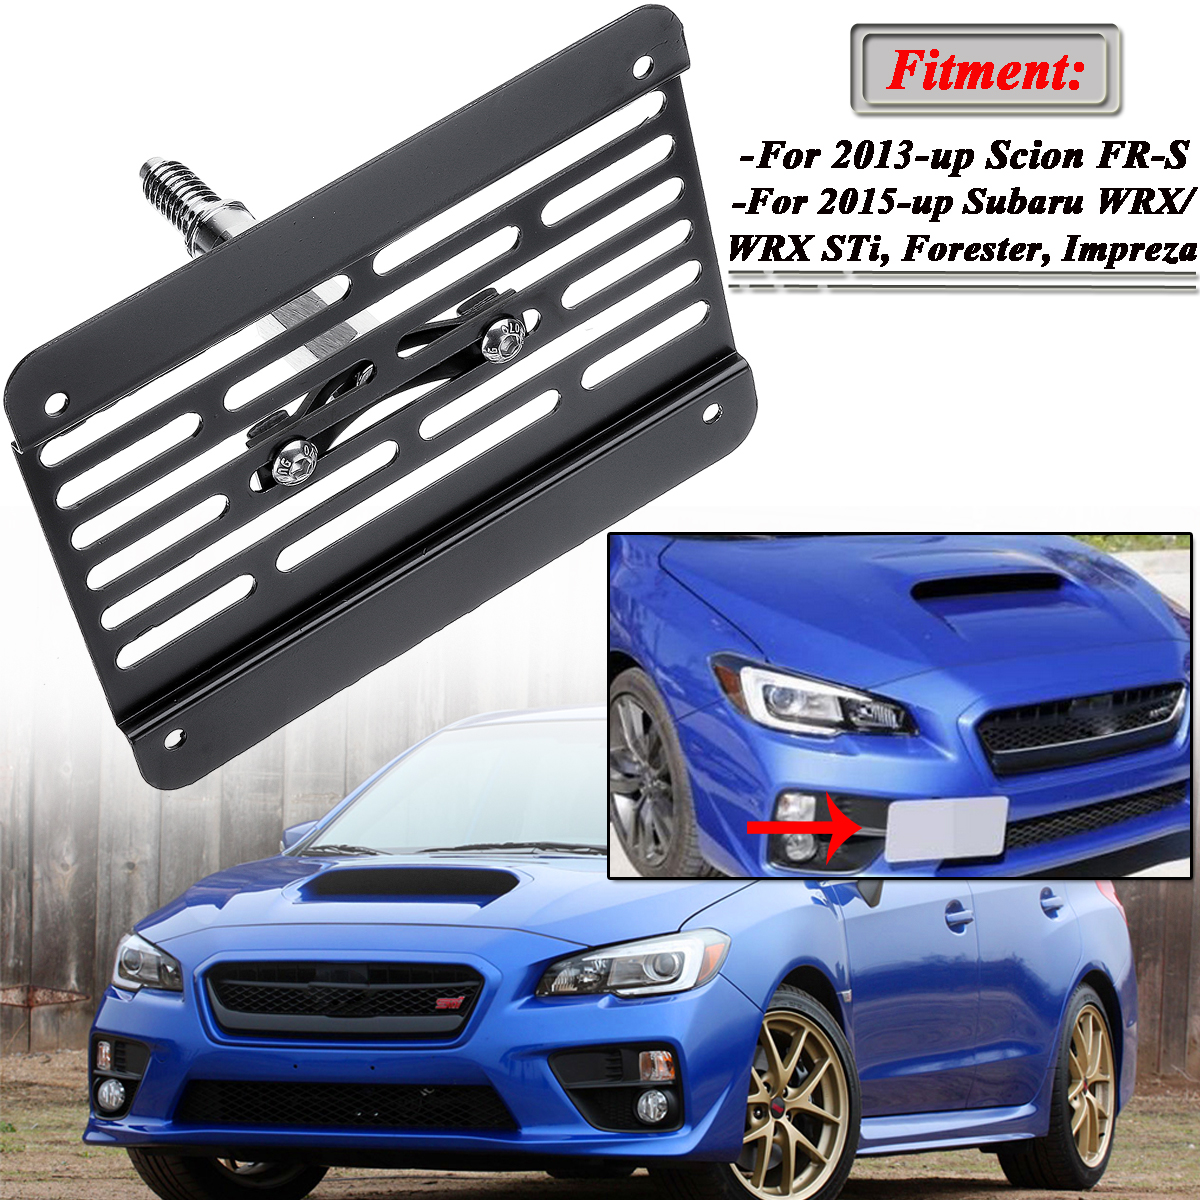 1PCS REAR Bumper Tow Hook Cover Cap TOW BRACKET for 2008-2009 Subaru Impreza WRX